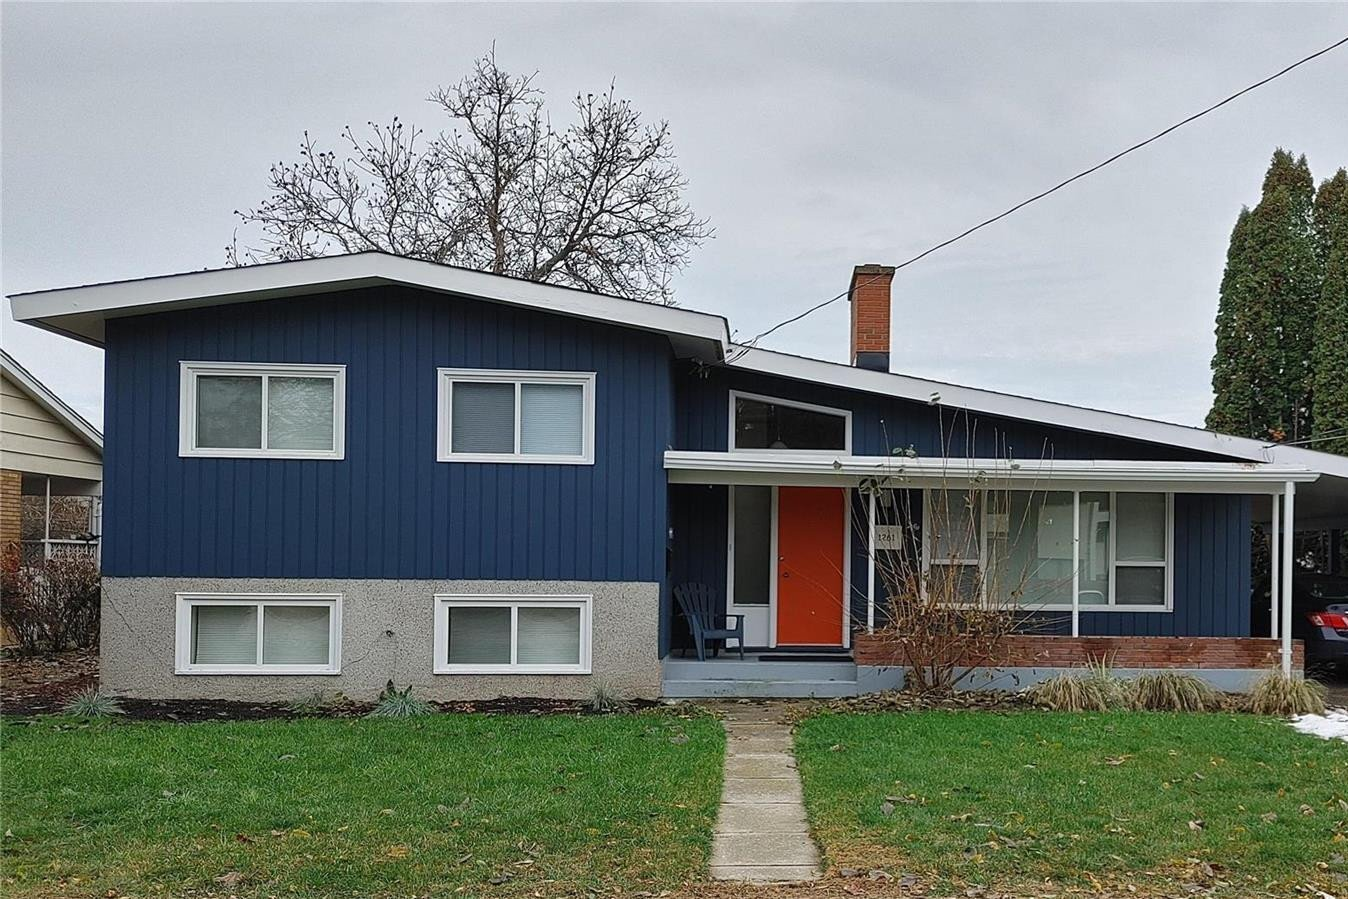 House for sale at 1261 Kelglen Cres Kelowna British Columbia - MLS: 10220542